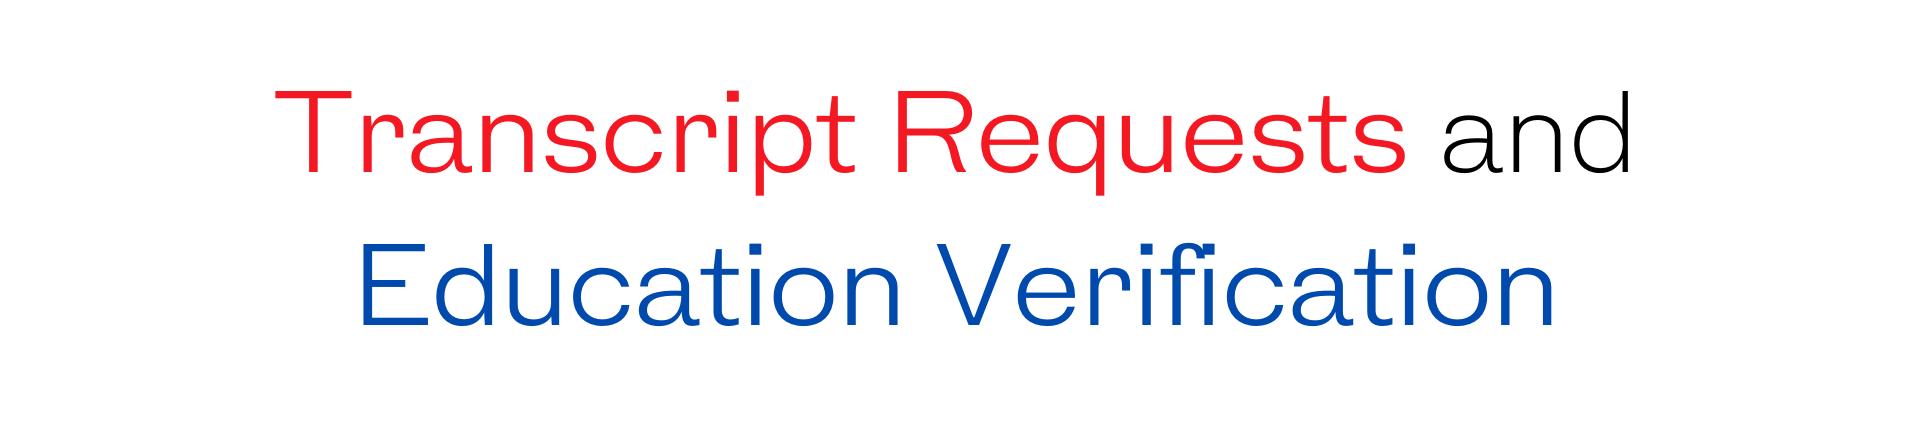 Transcript Requests and Education Verification